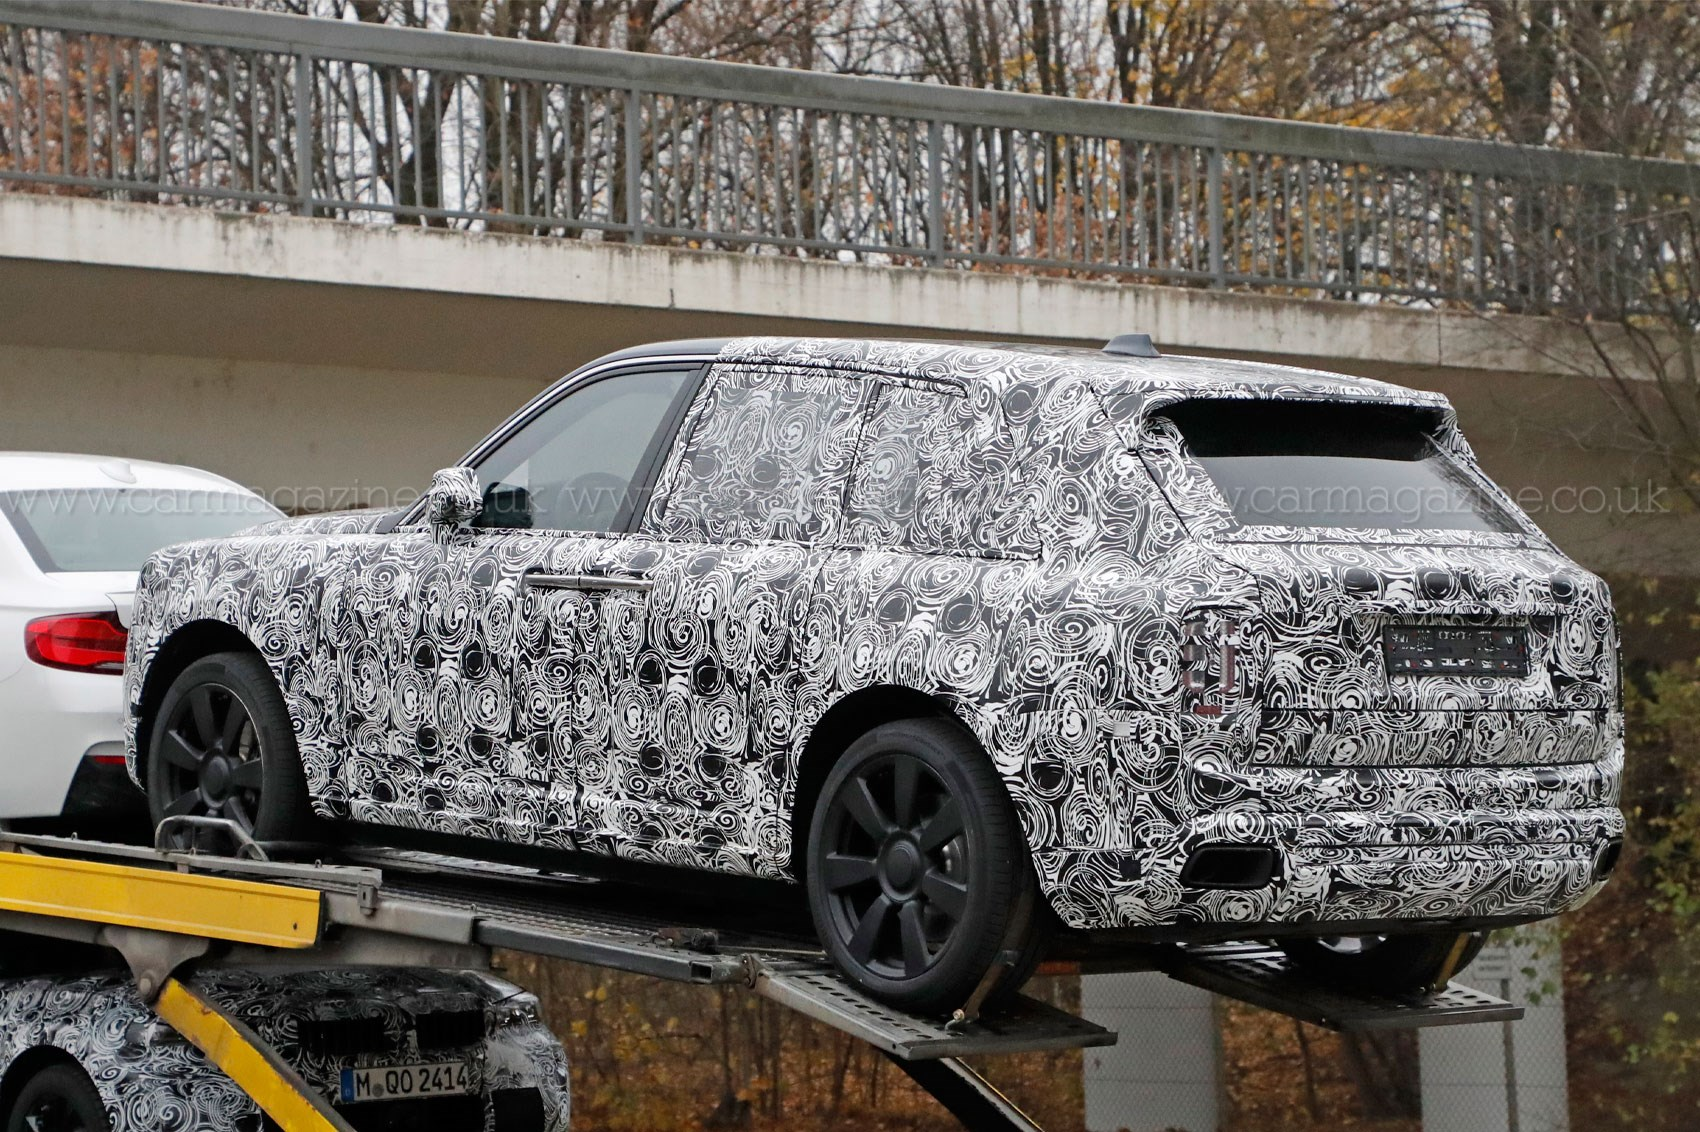 Rolls-Royce Cullinan SUV: closest look yet by CAR Magazine